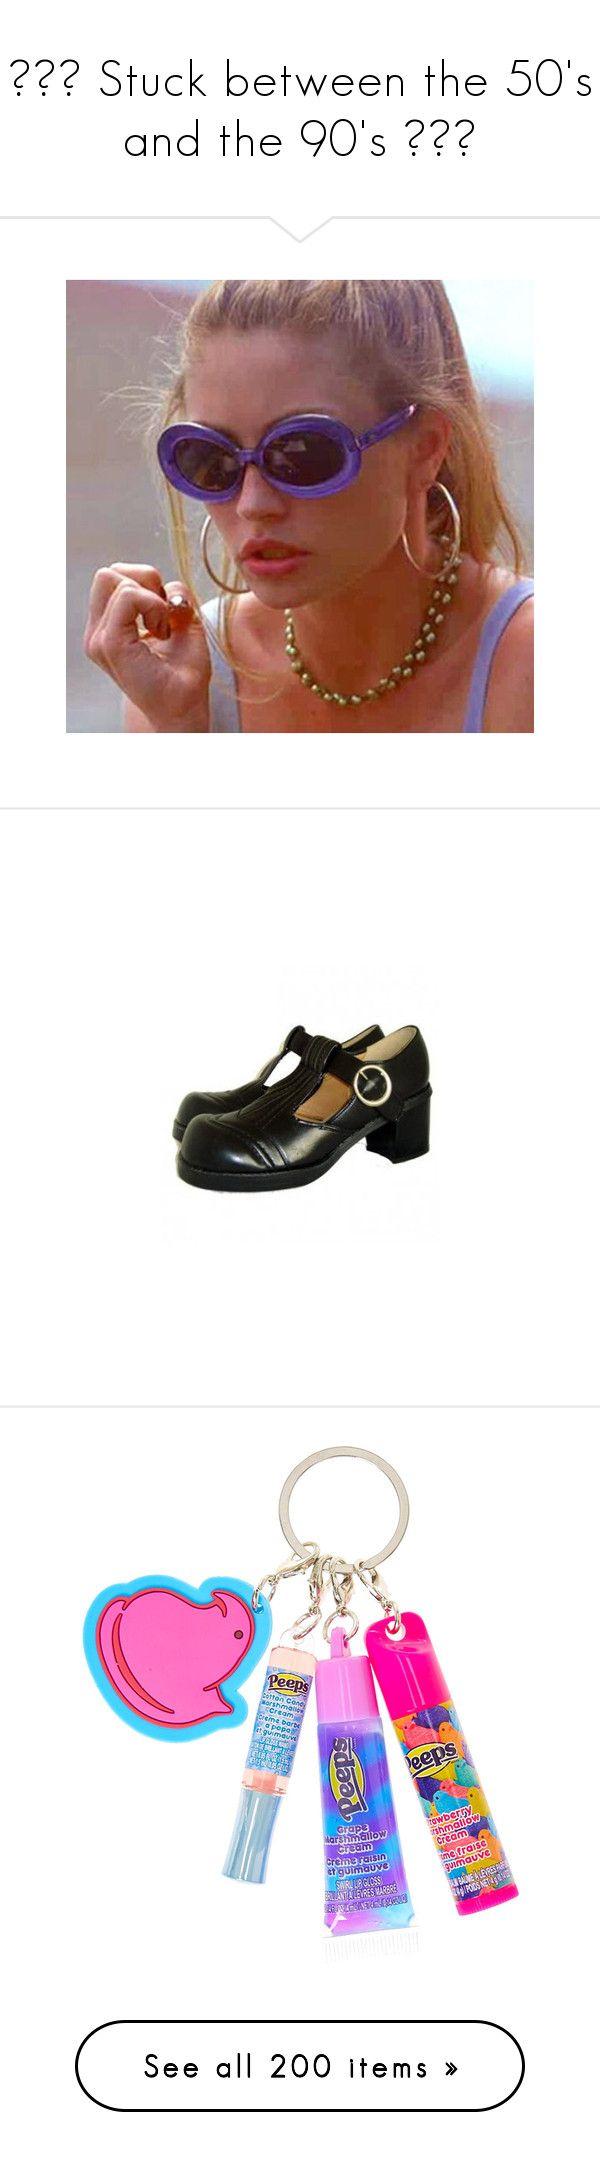 """💗🌸♡ Stuck between the 50's and the 90's ✧💜🍒"" by queenofrocknroll ❤ liked on Polyvore featuring shoes, pumps, heels, footwear, black, black platform pumps, black shoes, black heeled shoes, t strap platform pumps and high heel platform pumps"